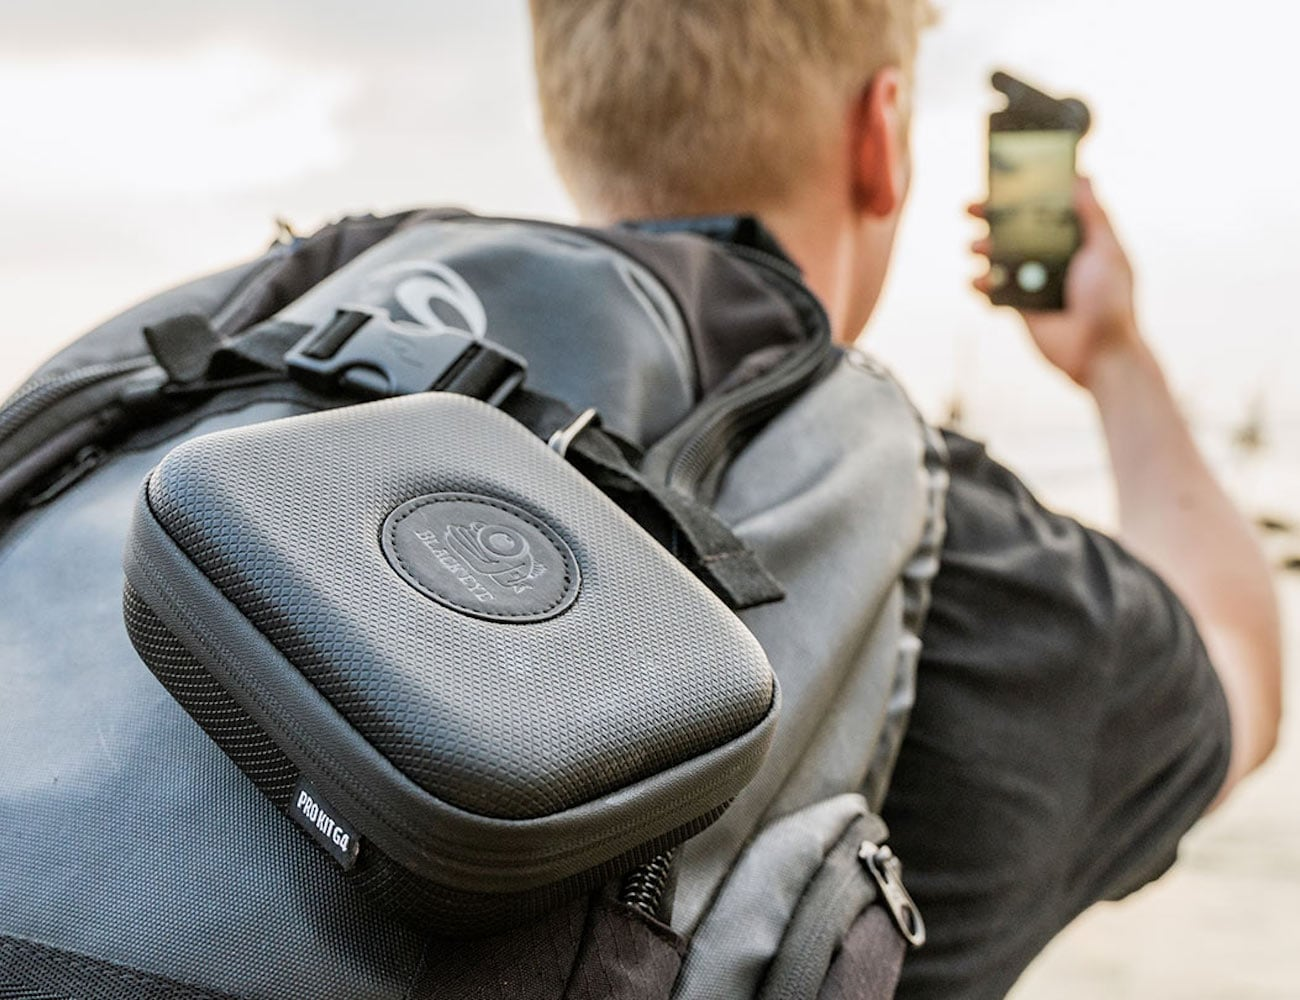 Black Eye Pro Kit G4 Adventure Lens Set will help you take your favorite photos